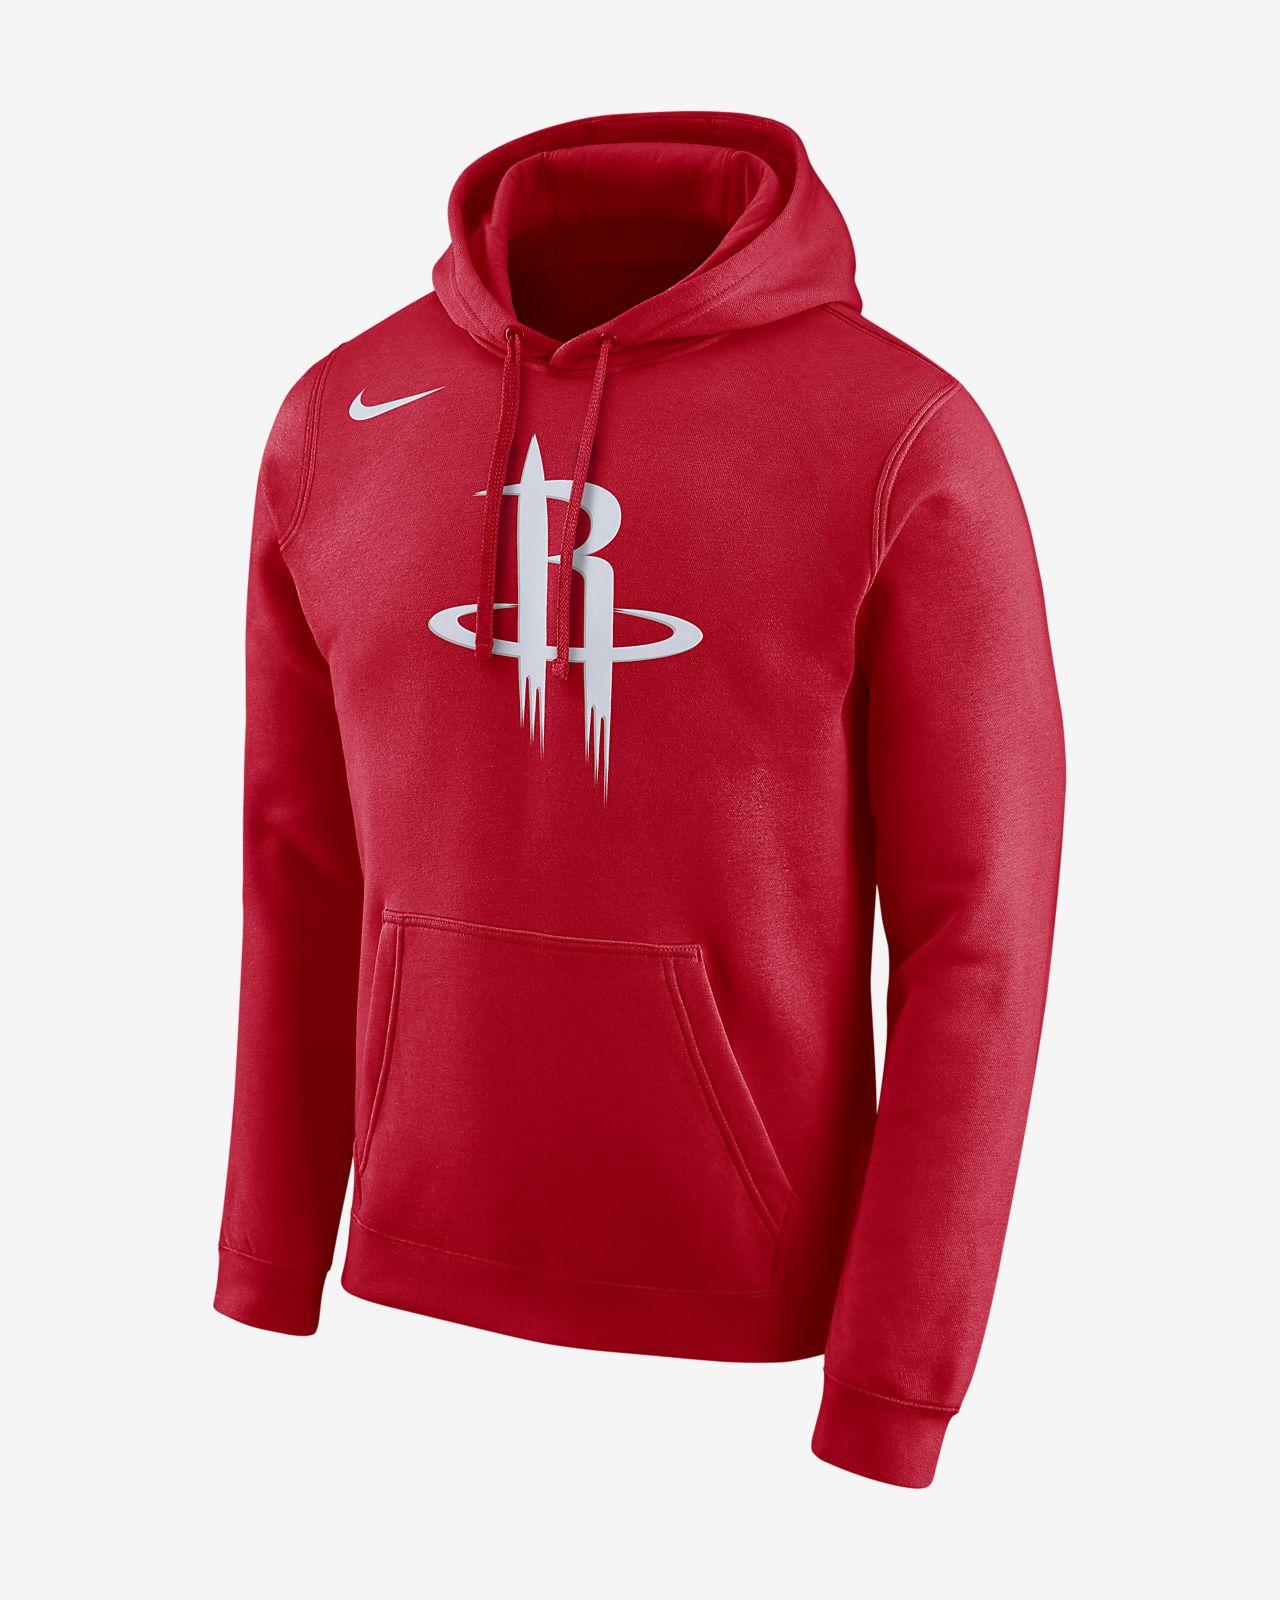 f66c49736c5 Houston Rockets Nike Men's Logo NBA Hoodie. Nike.com